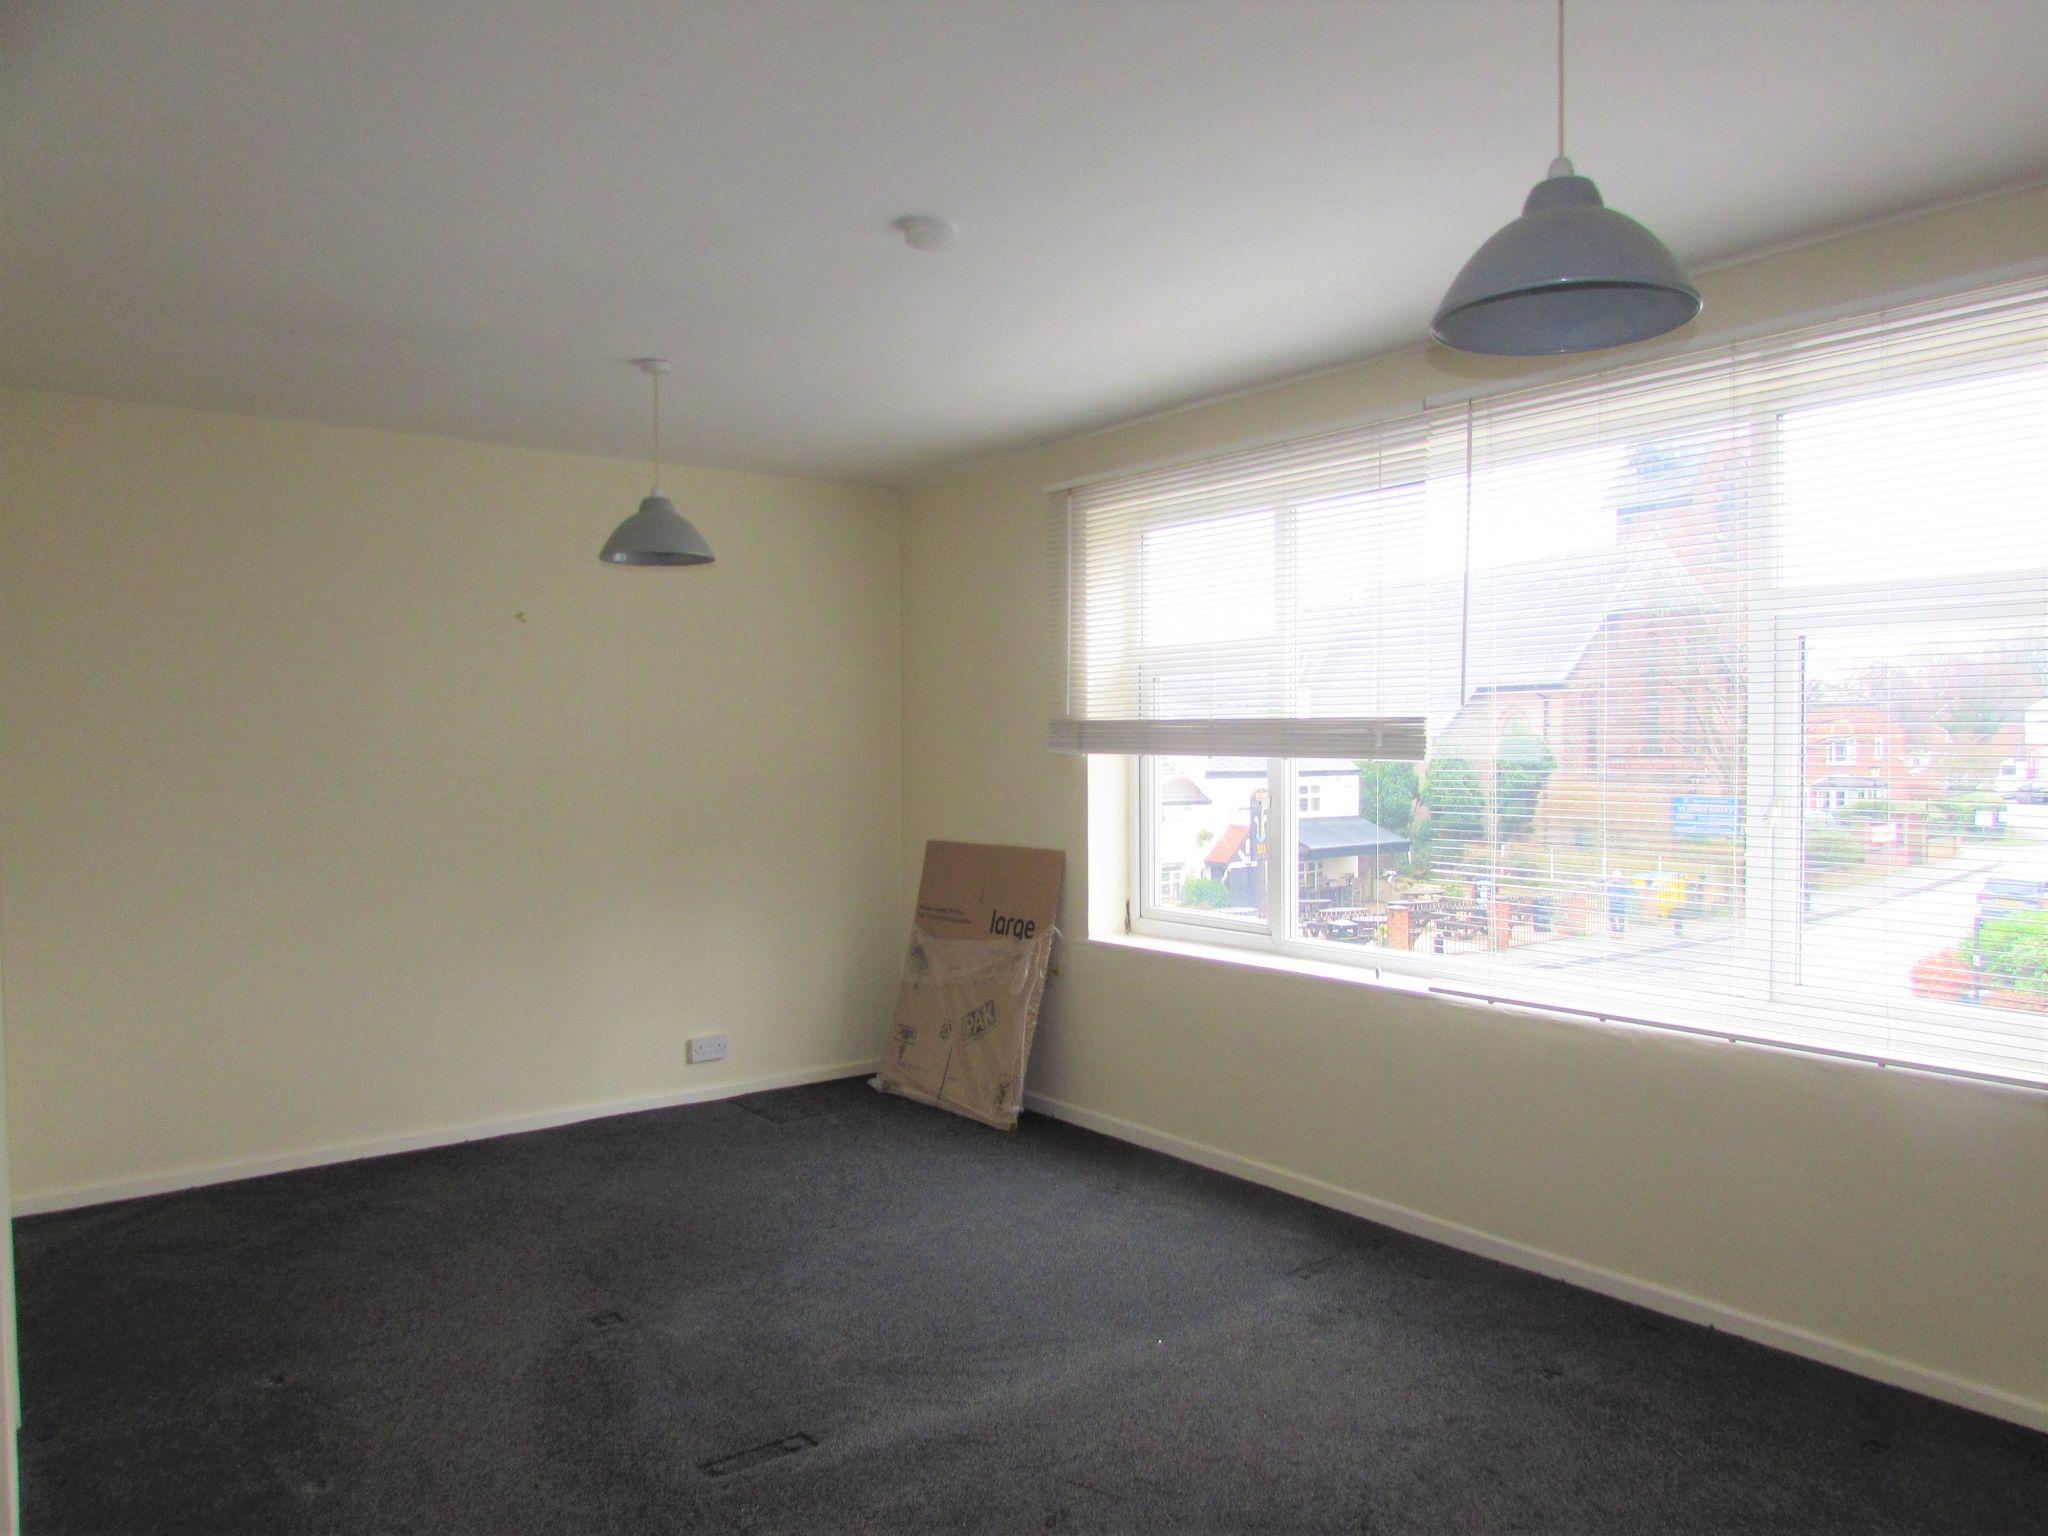 2 Bedroom Duplex Flat/apartment To Rent - Living area